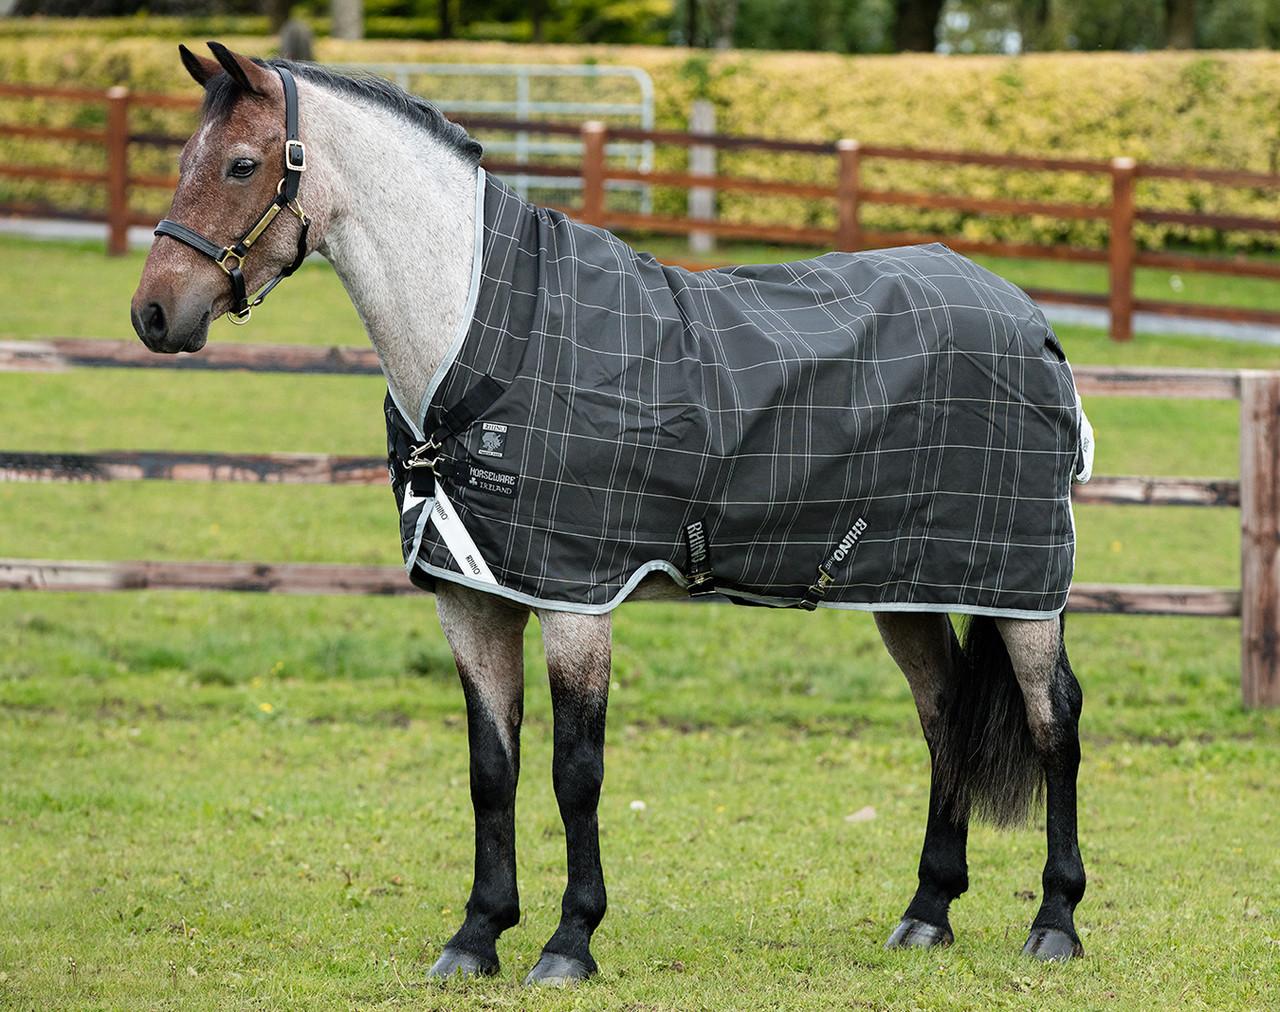 Horseware Ireland Rhino Pony Wug Turnout Blanket Medium 1000D Waterproof